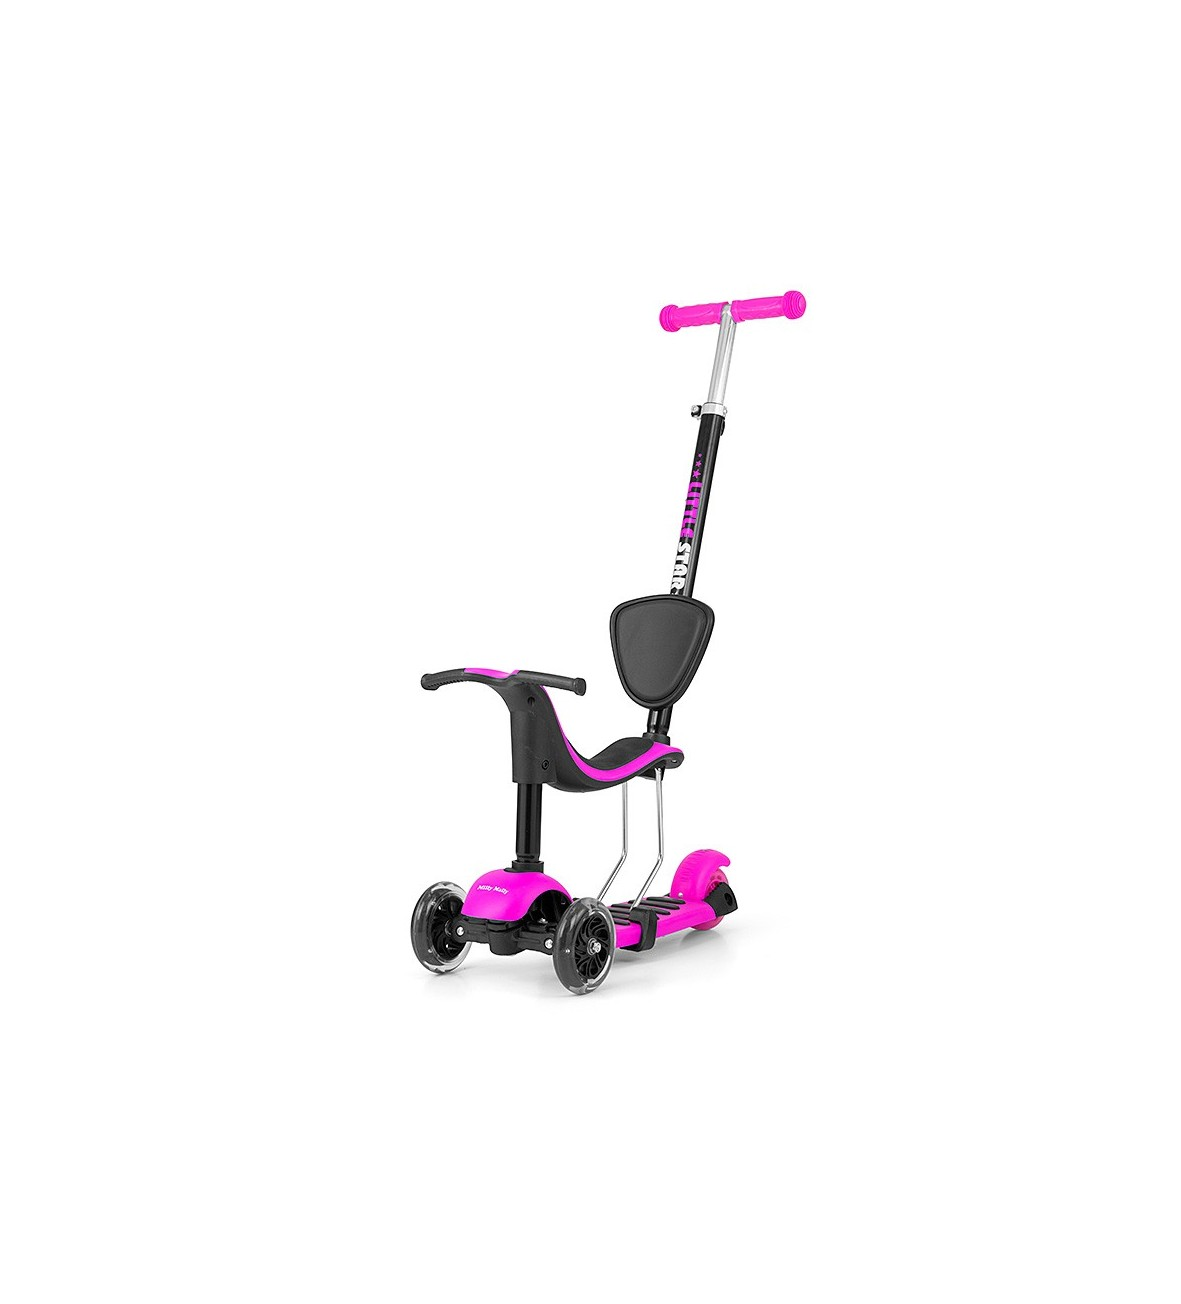 Hulajnoga Scooter Little Star Pink